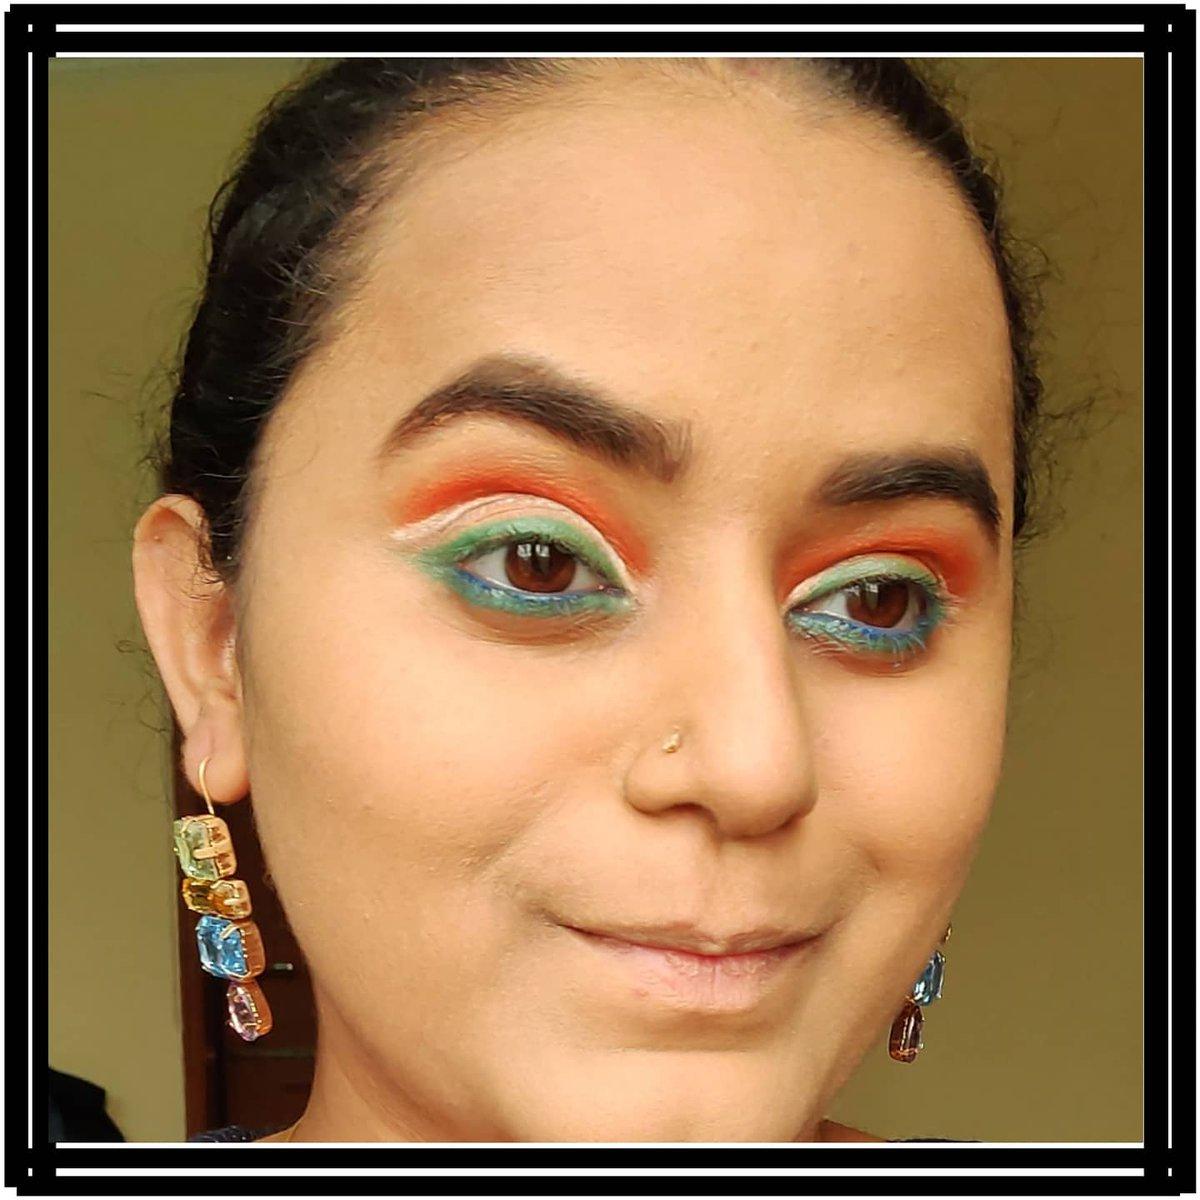 Happy Republic Day 2021 . Pallete used : @cuffsnlashes yolo face paints @imagiccosmeticsindia @wetnwildindia white kajal pencil . #makeup #beauty #makeupartist  #picoftheday #bhfyp #makeupadd #cuffsnlashes #nidhikatiyar #eyeliner #eyeshadow